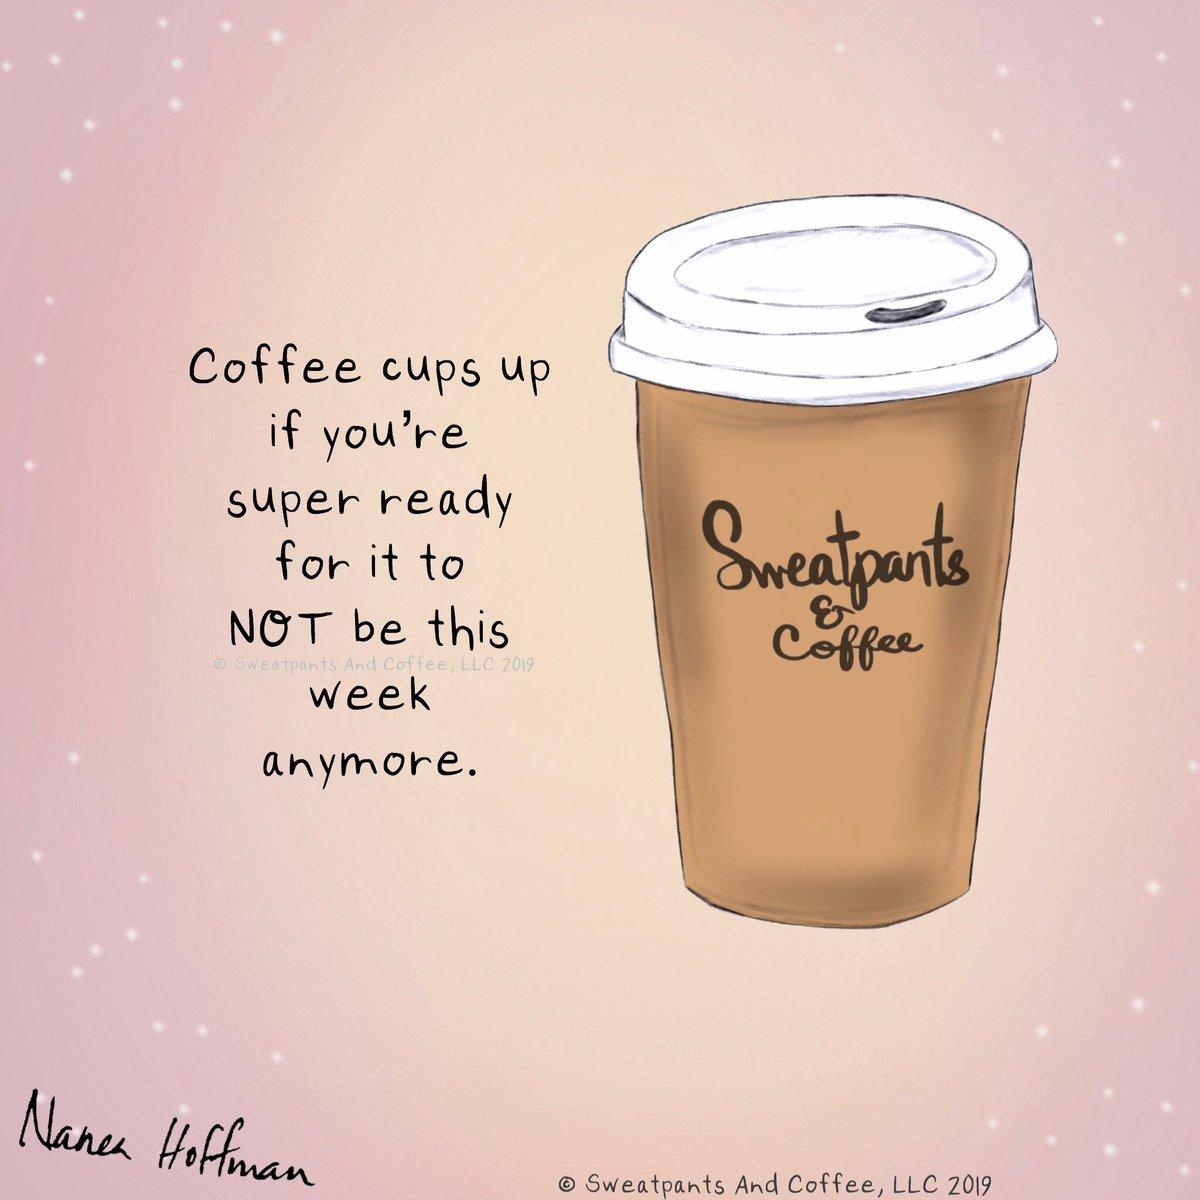 Sweatpants Coffee On Twitter C Mon Weekend Coffee Coffeetime Coffeelover Coffeequotes Coffeememe Sweatpantsandcoffee Tgif Friday